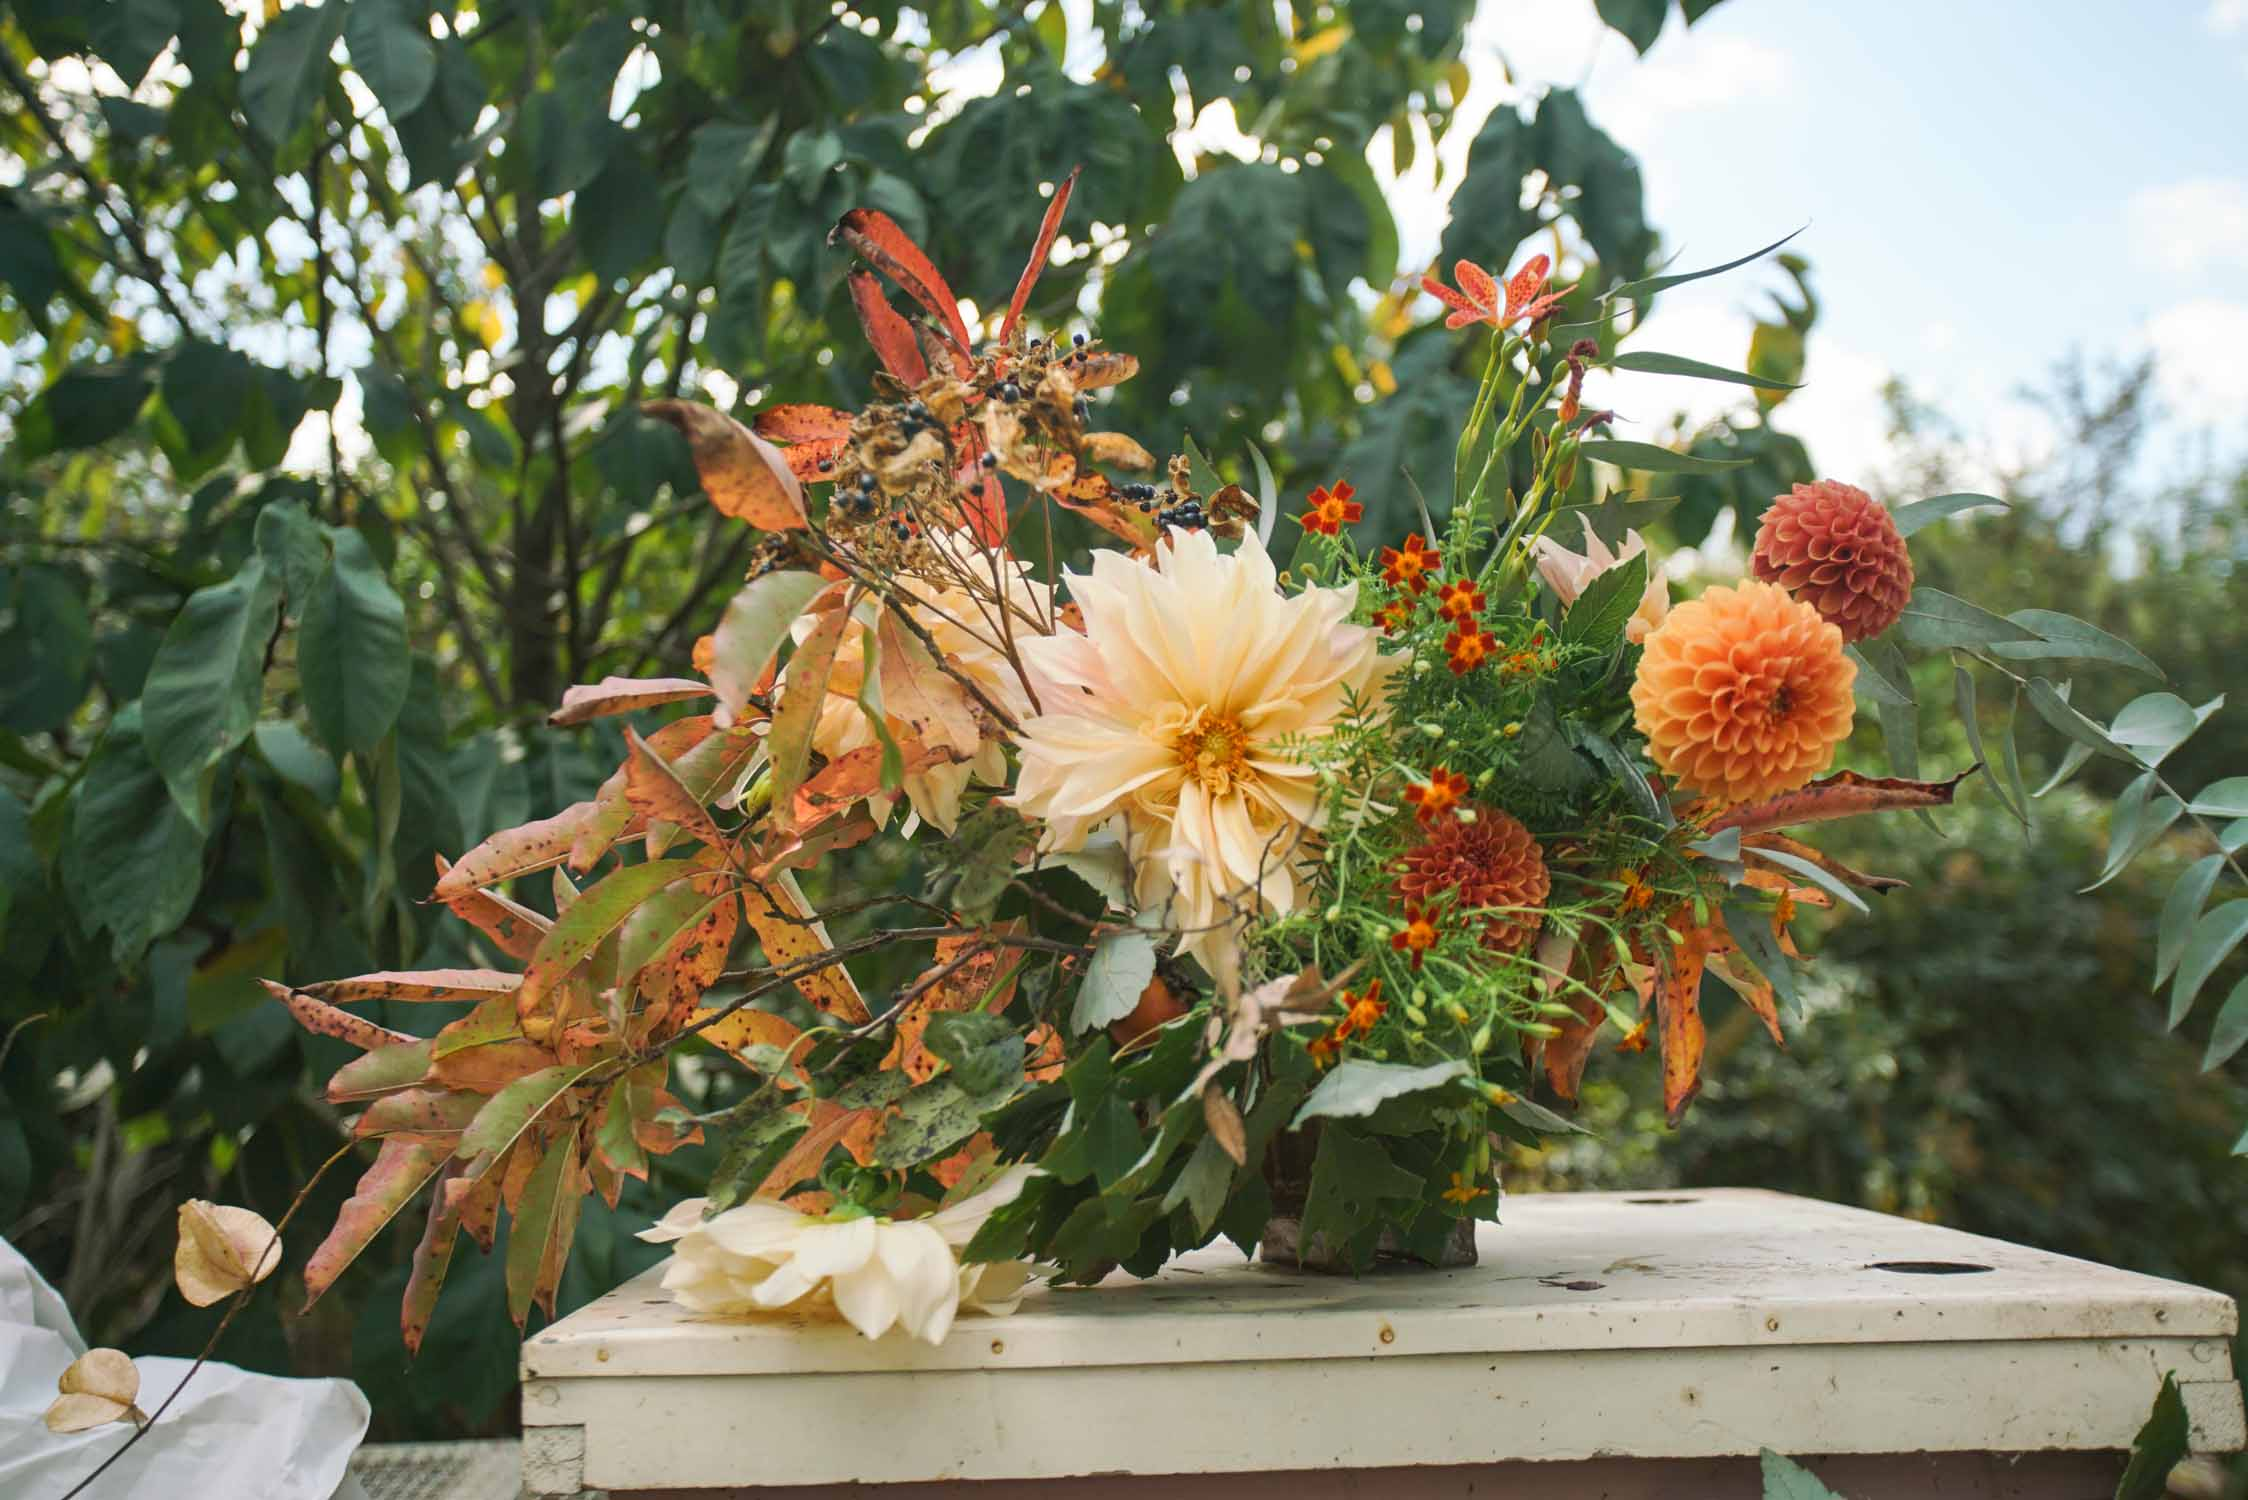 RA_3 porch farm 2016 flower social-2016101709126.jpg